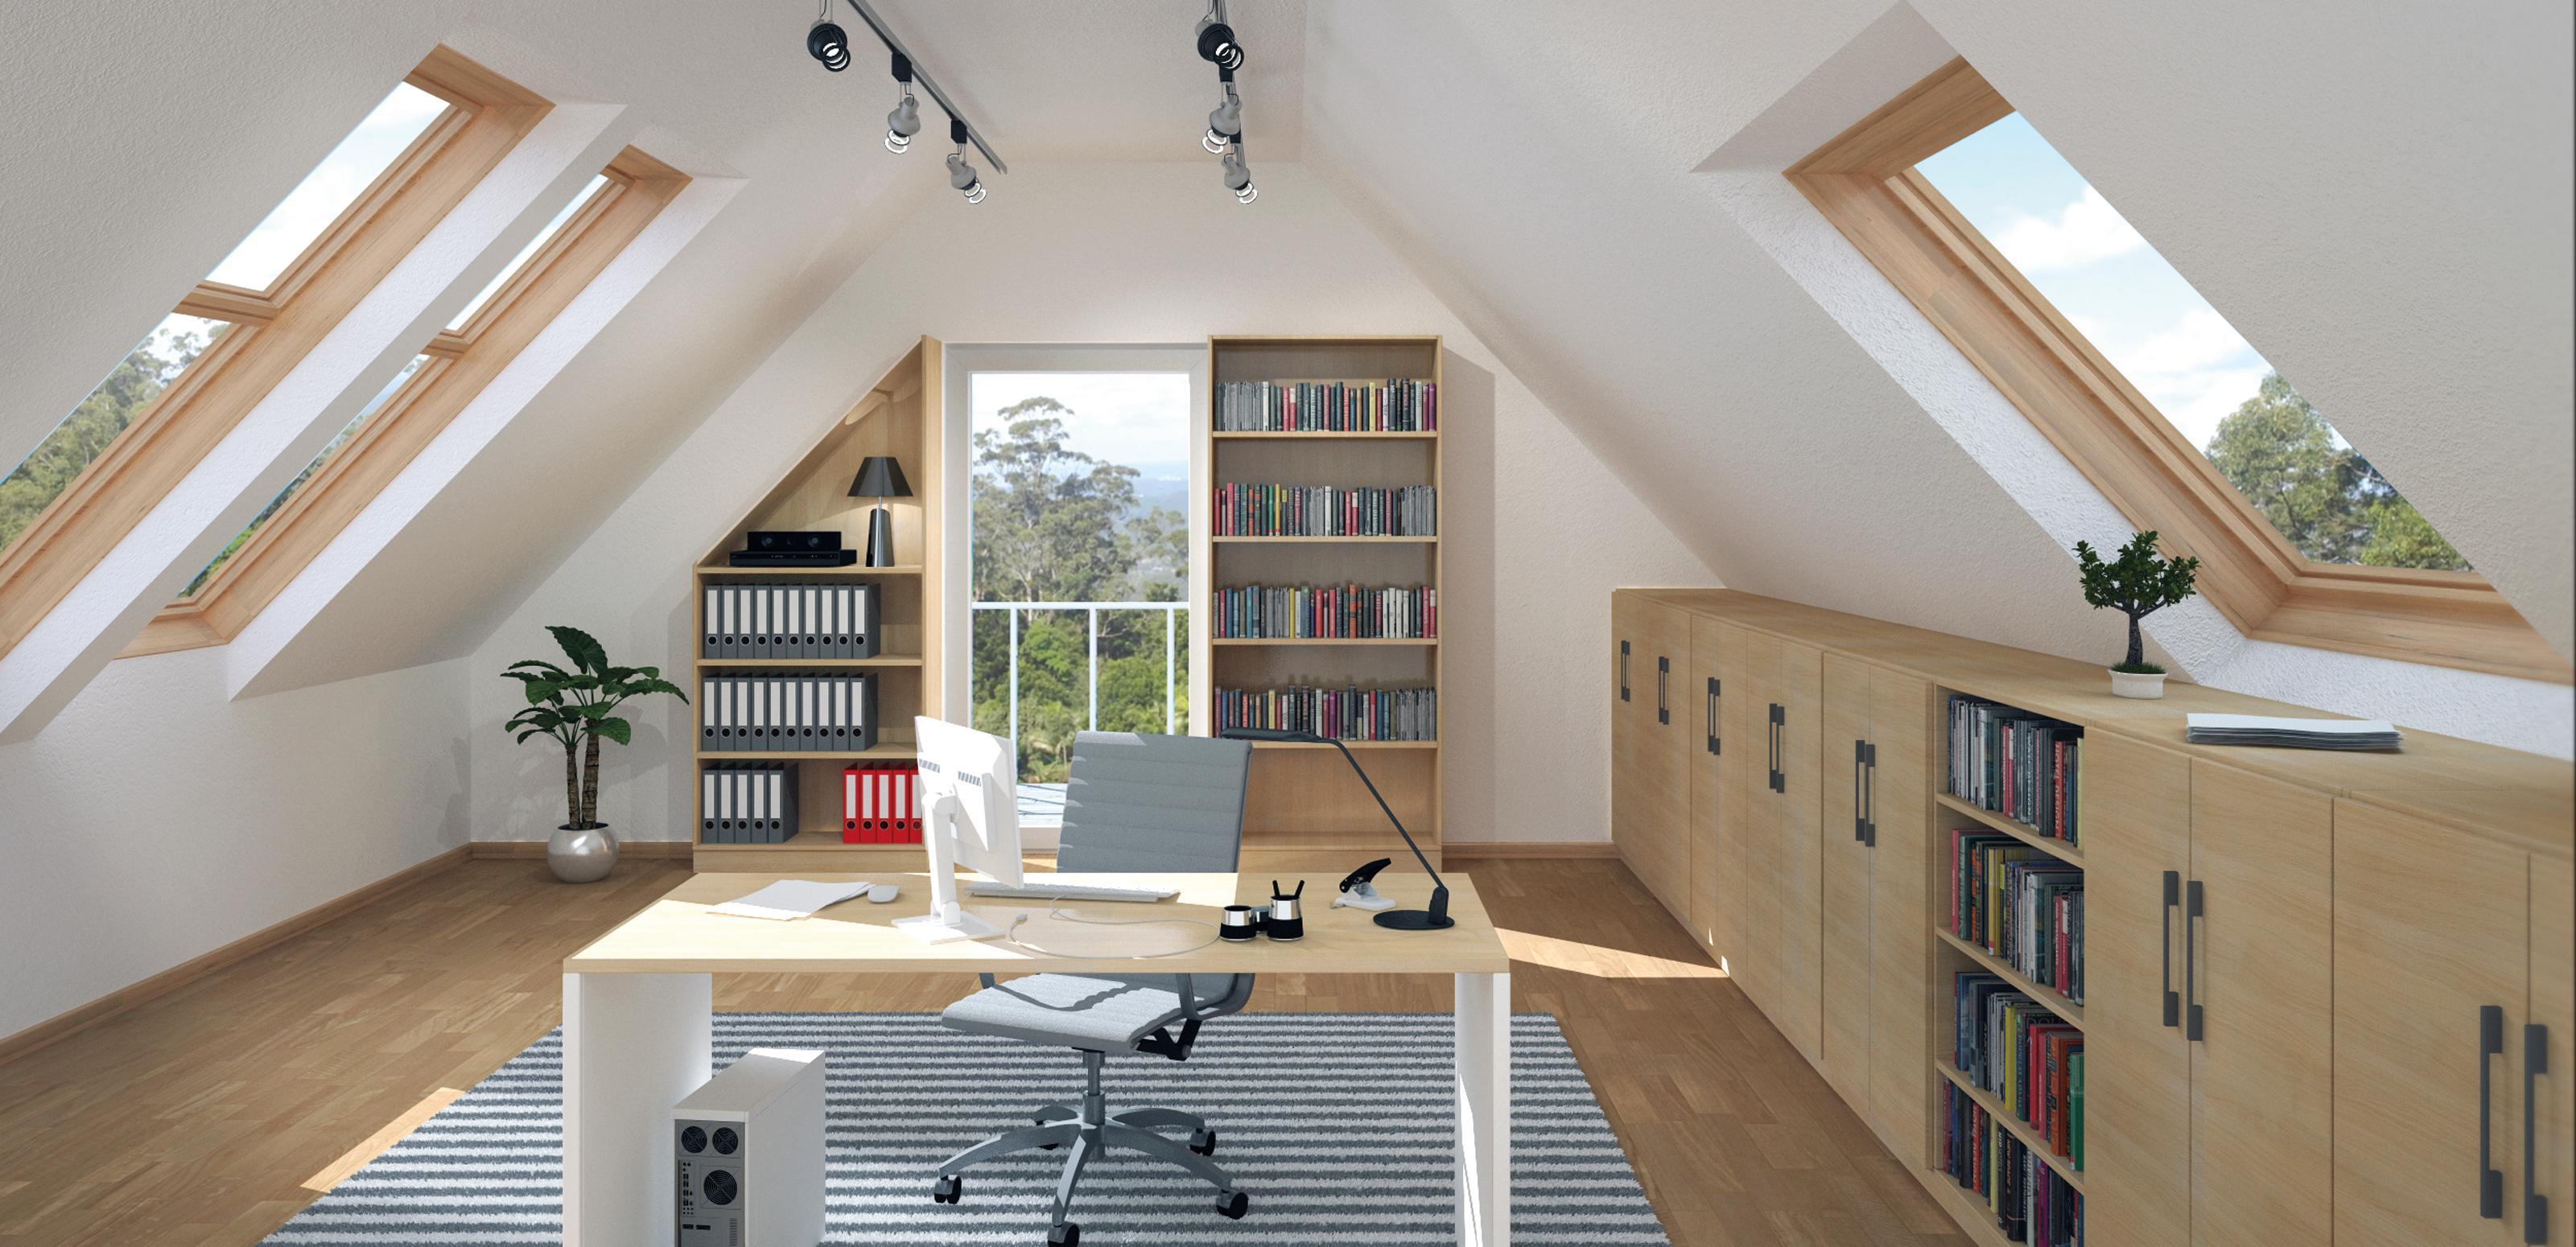 heimbüro #dachschräge #regal #arbeitszimmer ©deinsch